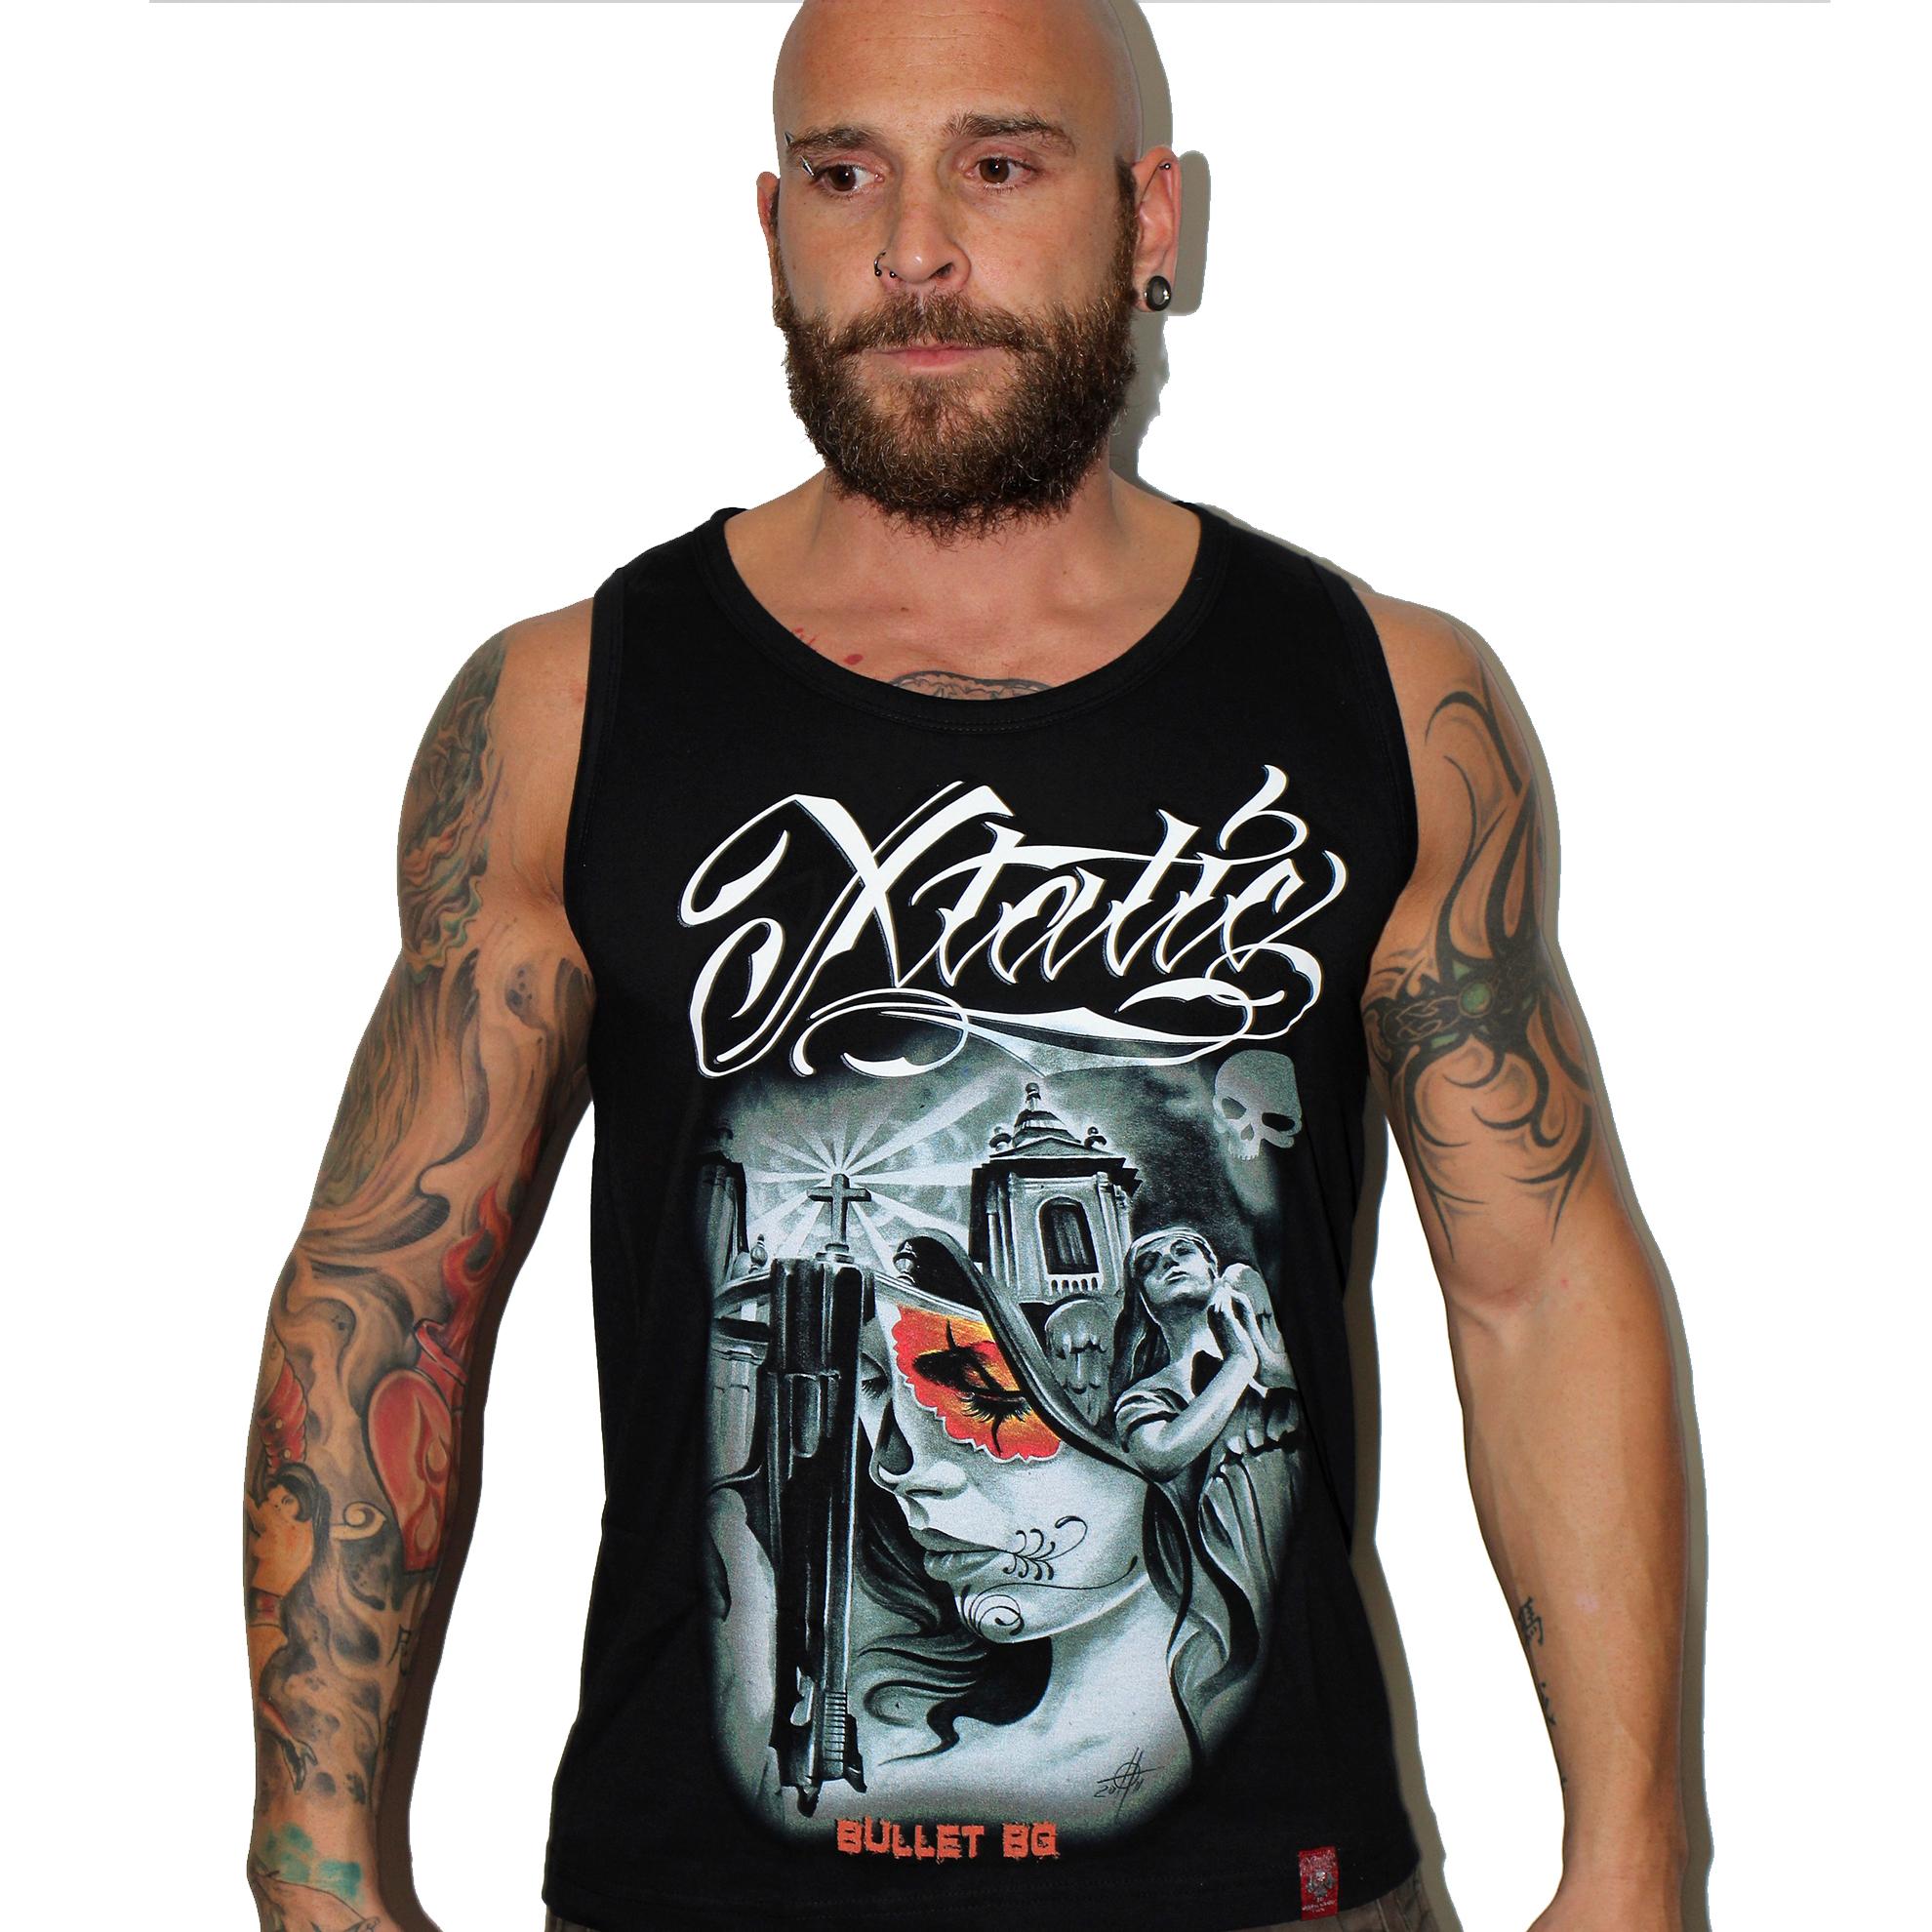 xtatic_wear_bullet_bg_art_tank_top_t_shirts_5.jpg